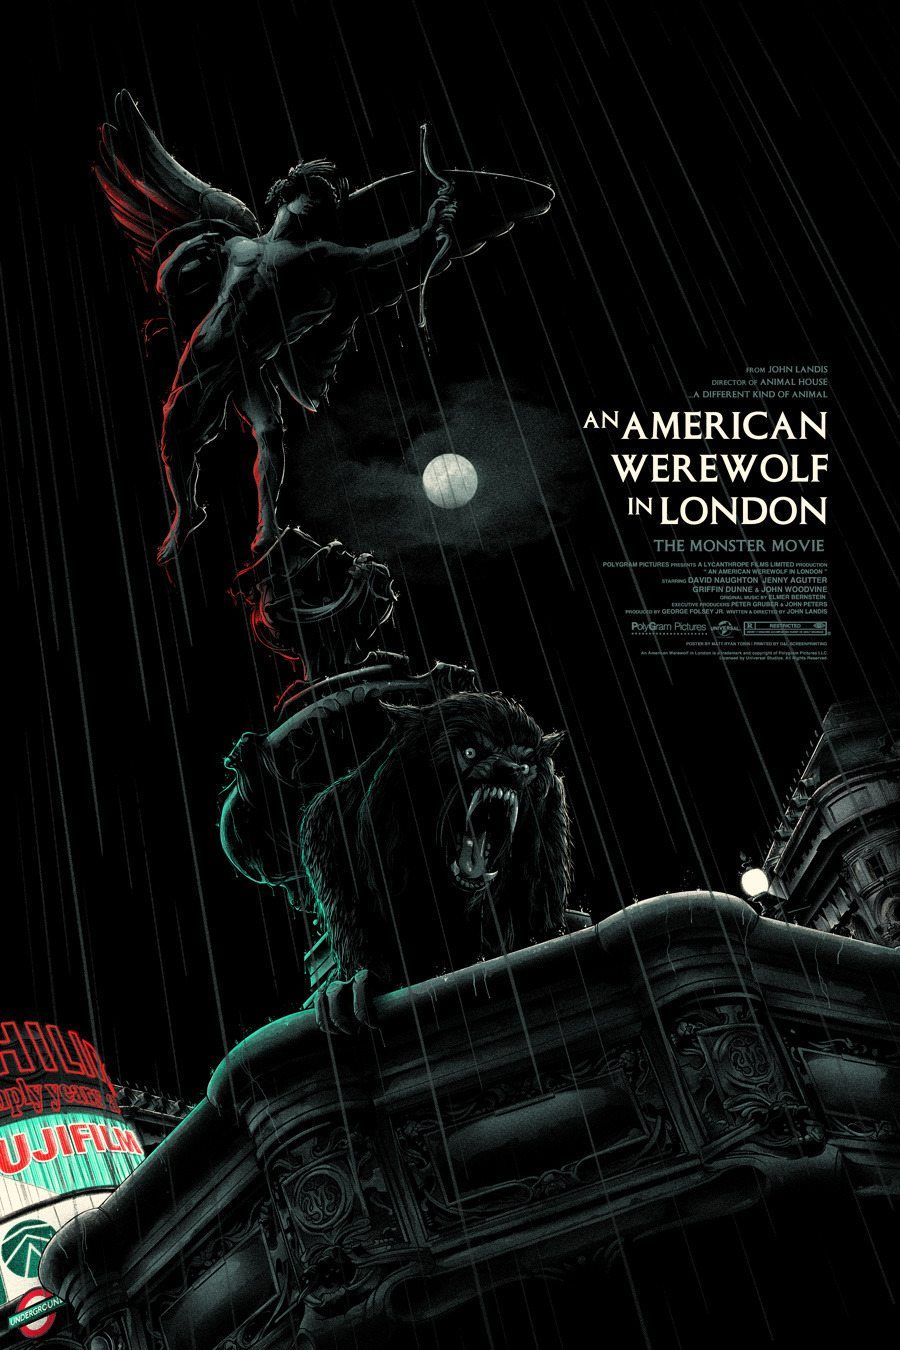 An American Werewolf In London 1981 Hd Wallpaper From Gallsource